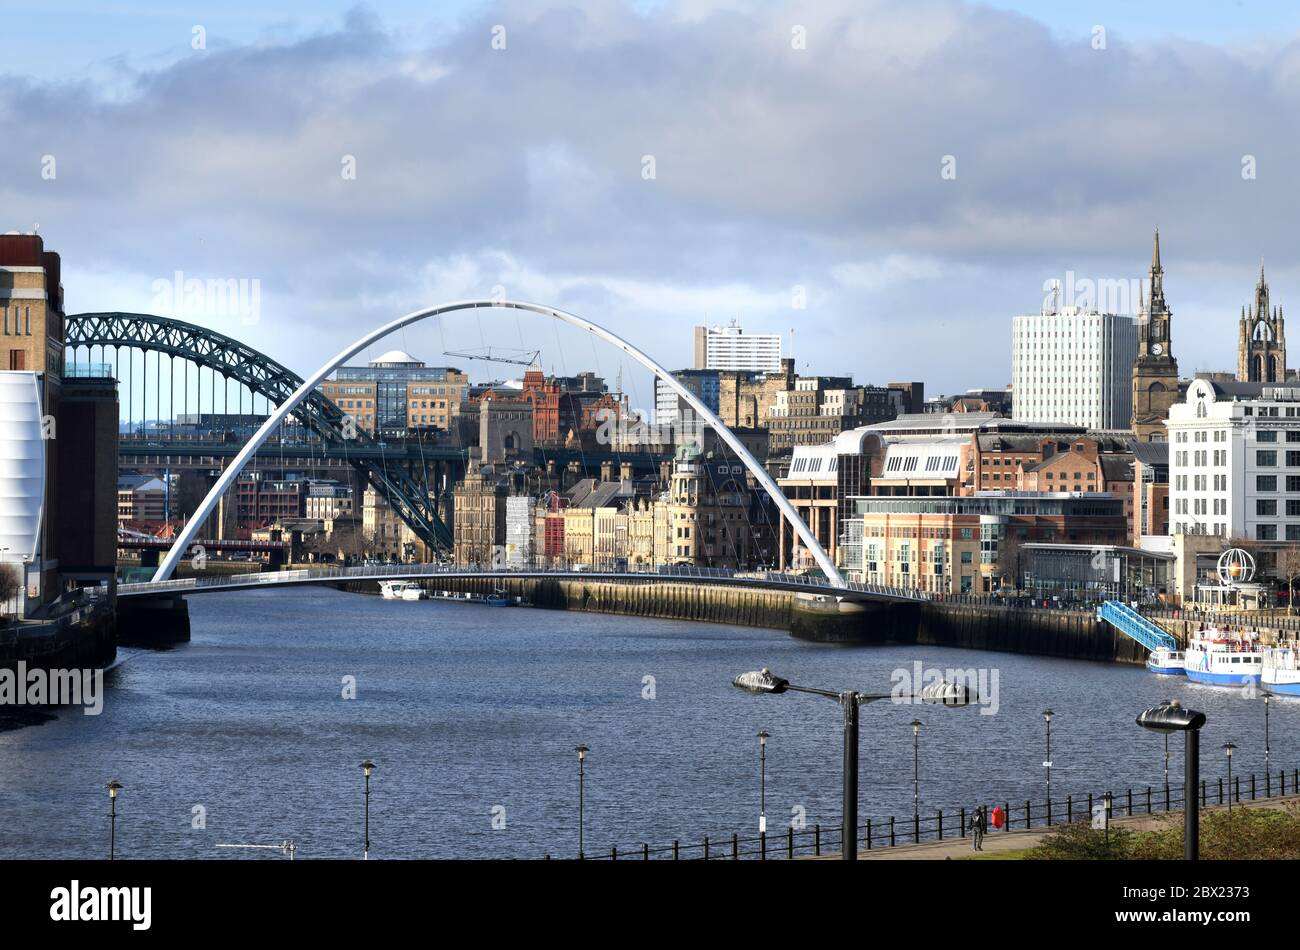 Newcastle upon Tyne skyline and River Tyne showing The Millennium Bridge and The Tyne Bridge. Stock Photo